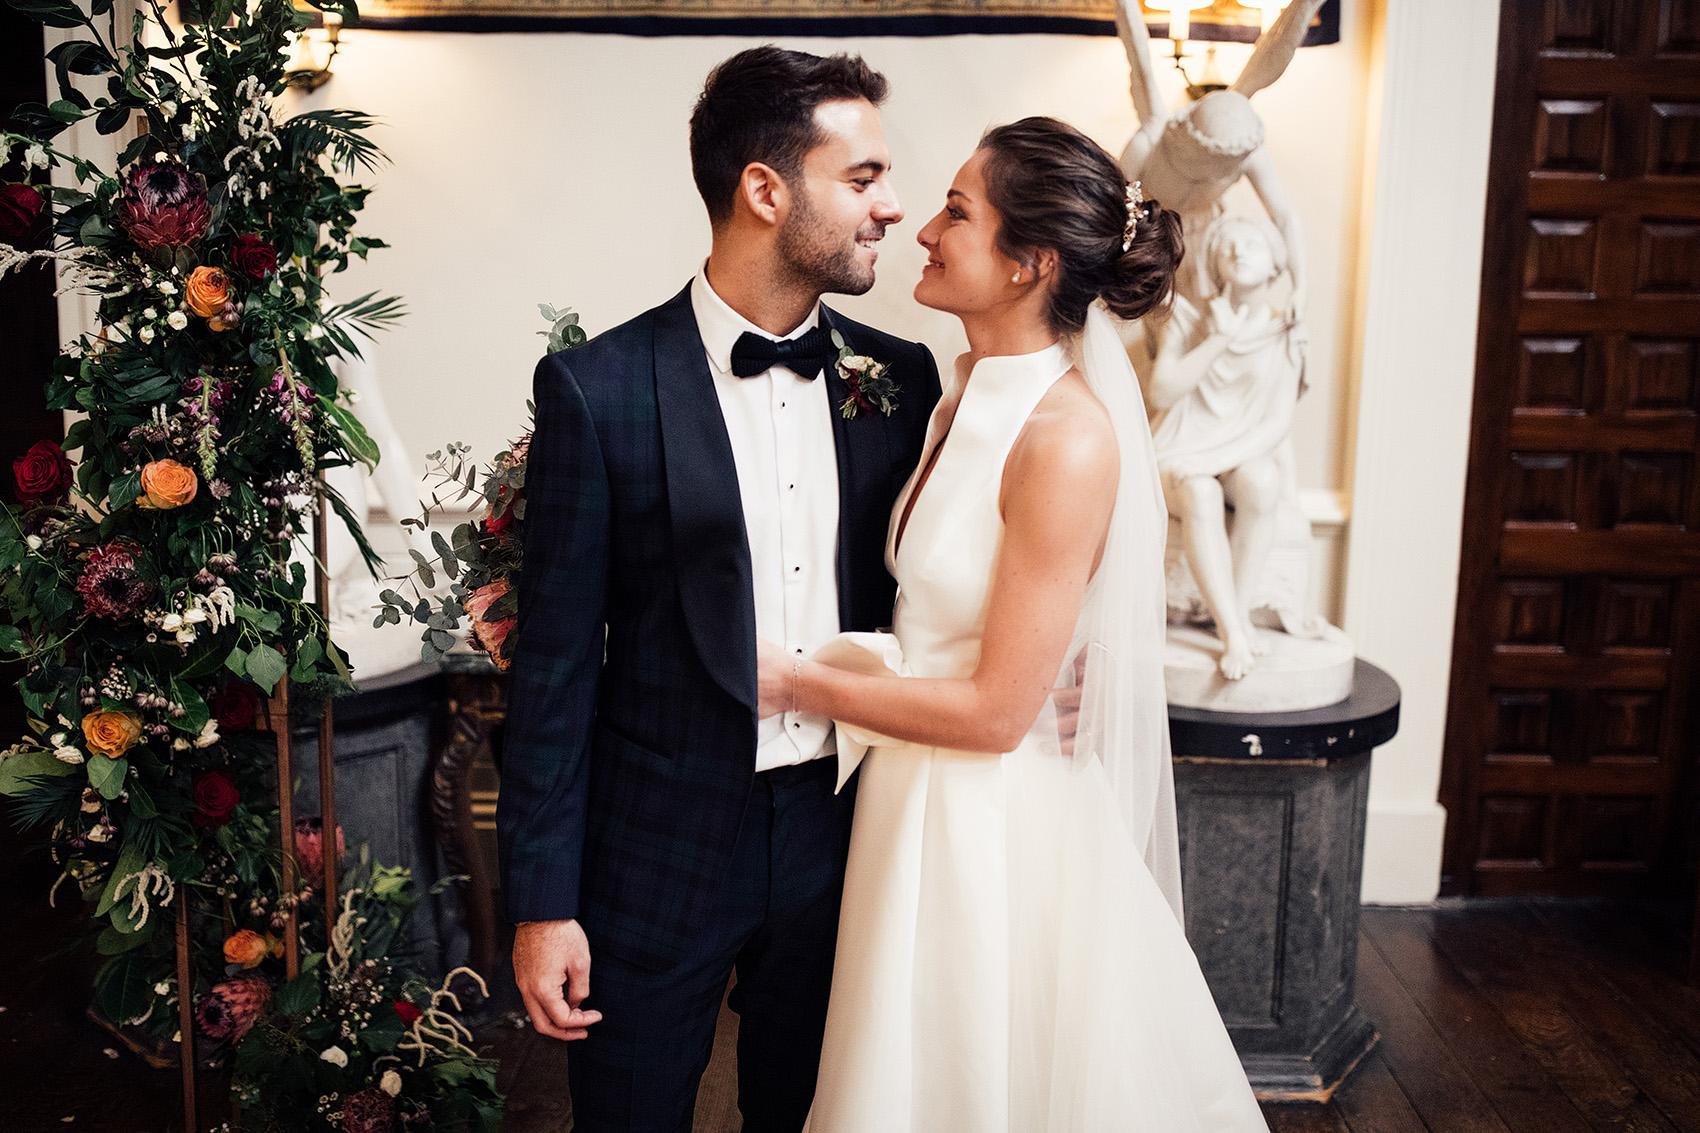 elmore-court-wedding-photography-50.jpg